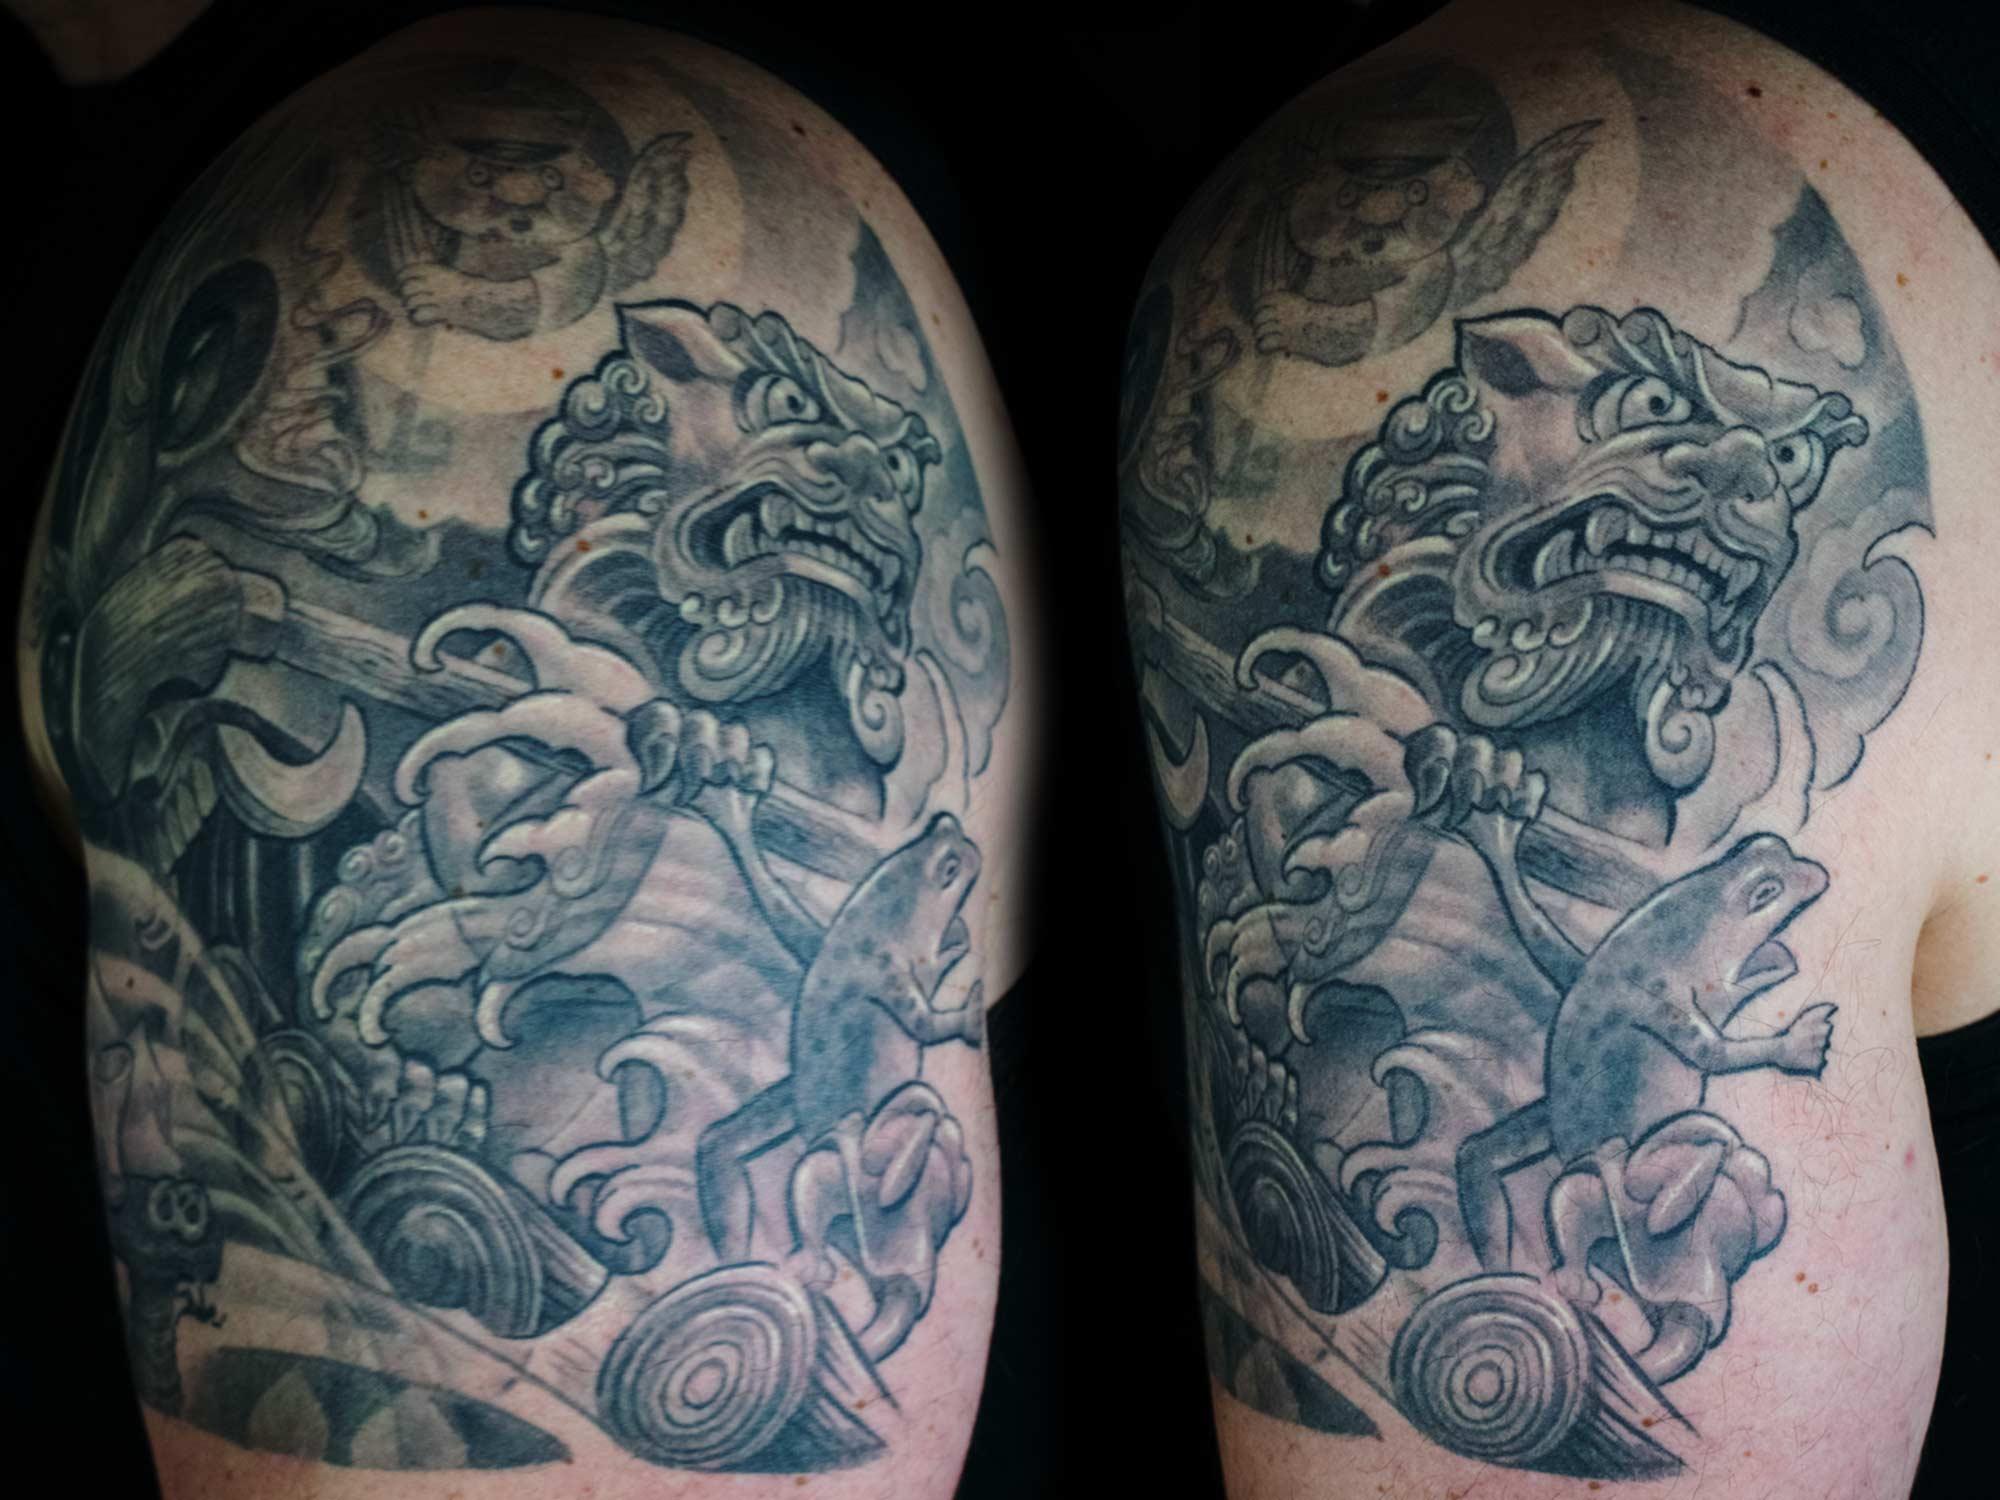 Oni-Maske-japanisch-Isar-Foo-Dog-Bayerische-Höllentalklamm-Aloisius-Hendl-Frosch-Flossfahrt-Tattoo-Raul-Shit-for-Life-Hits-for-Life--2